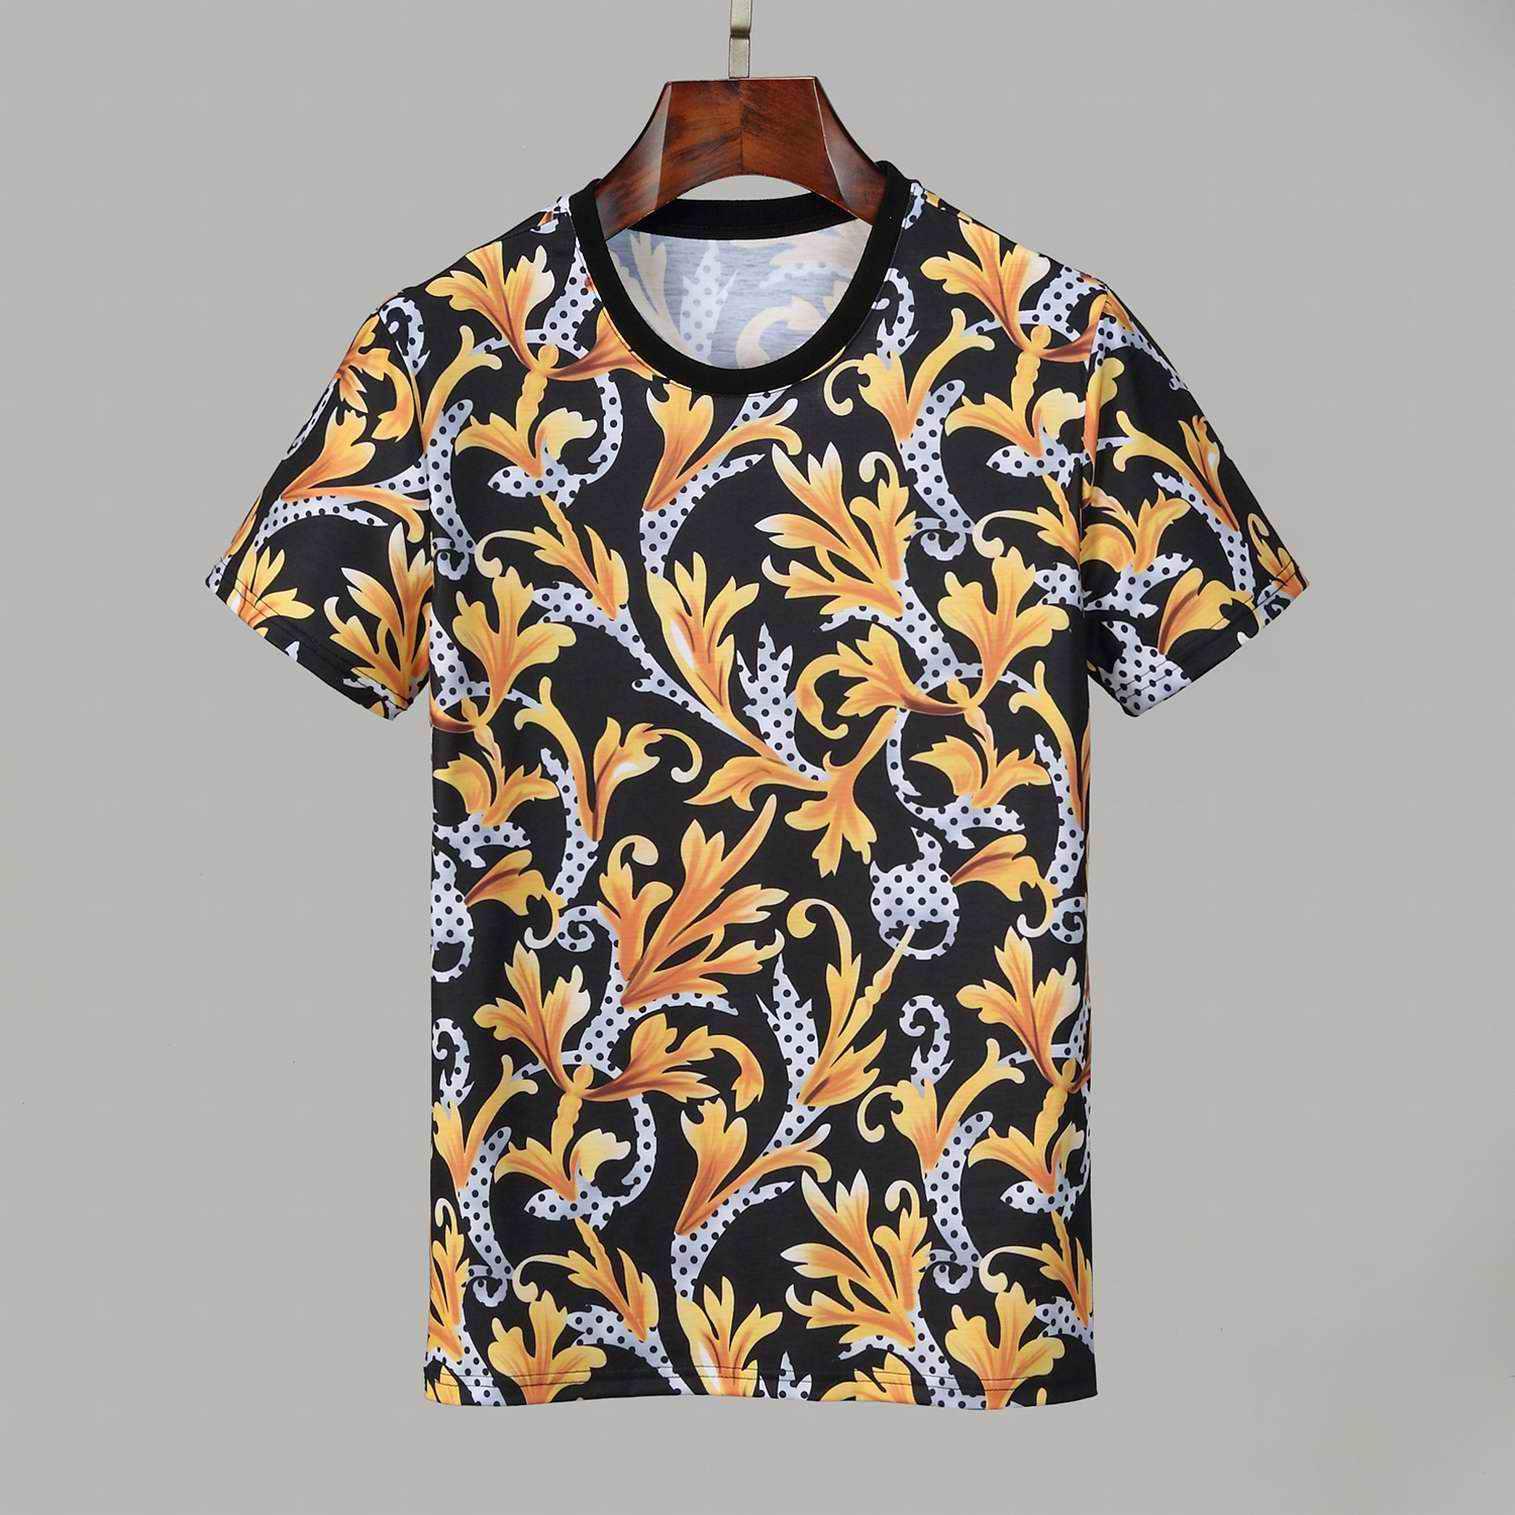 Versace Shirts 019